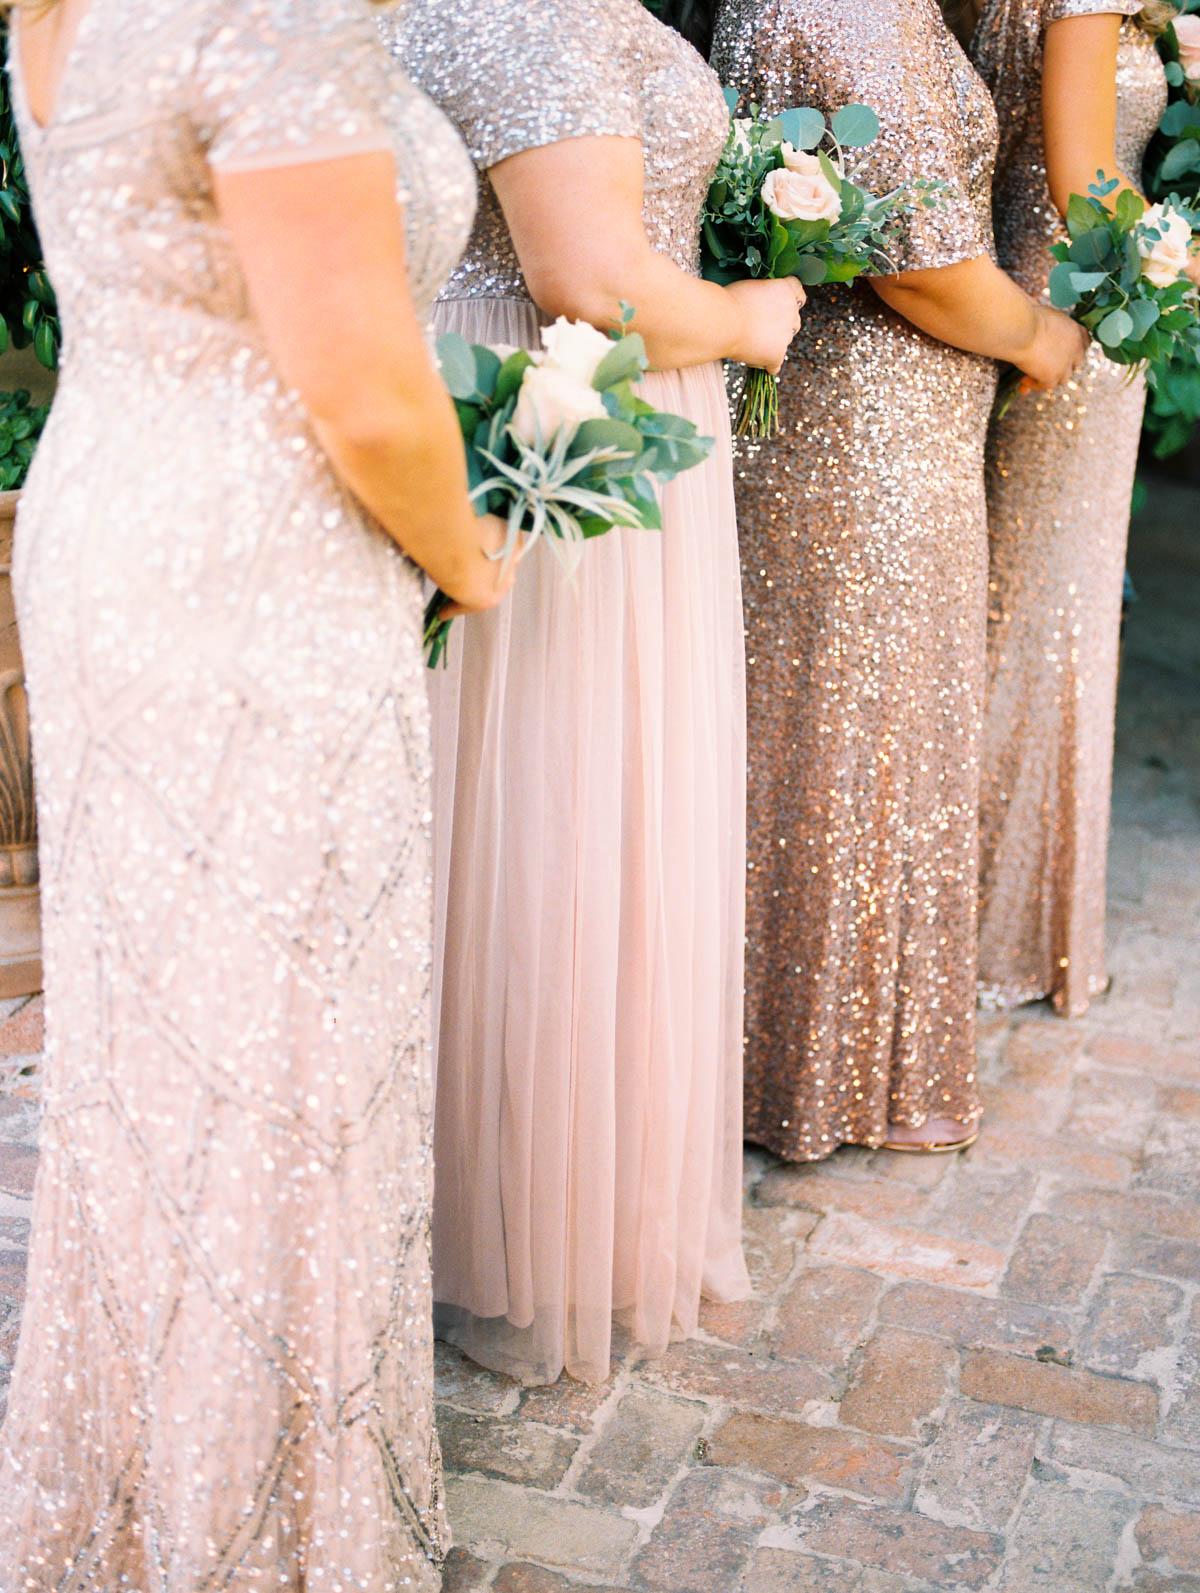 Blush bridesmaids bouquets Stillwell House wedding captured by Tucson Wedding Photographers Betsy & John